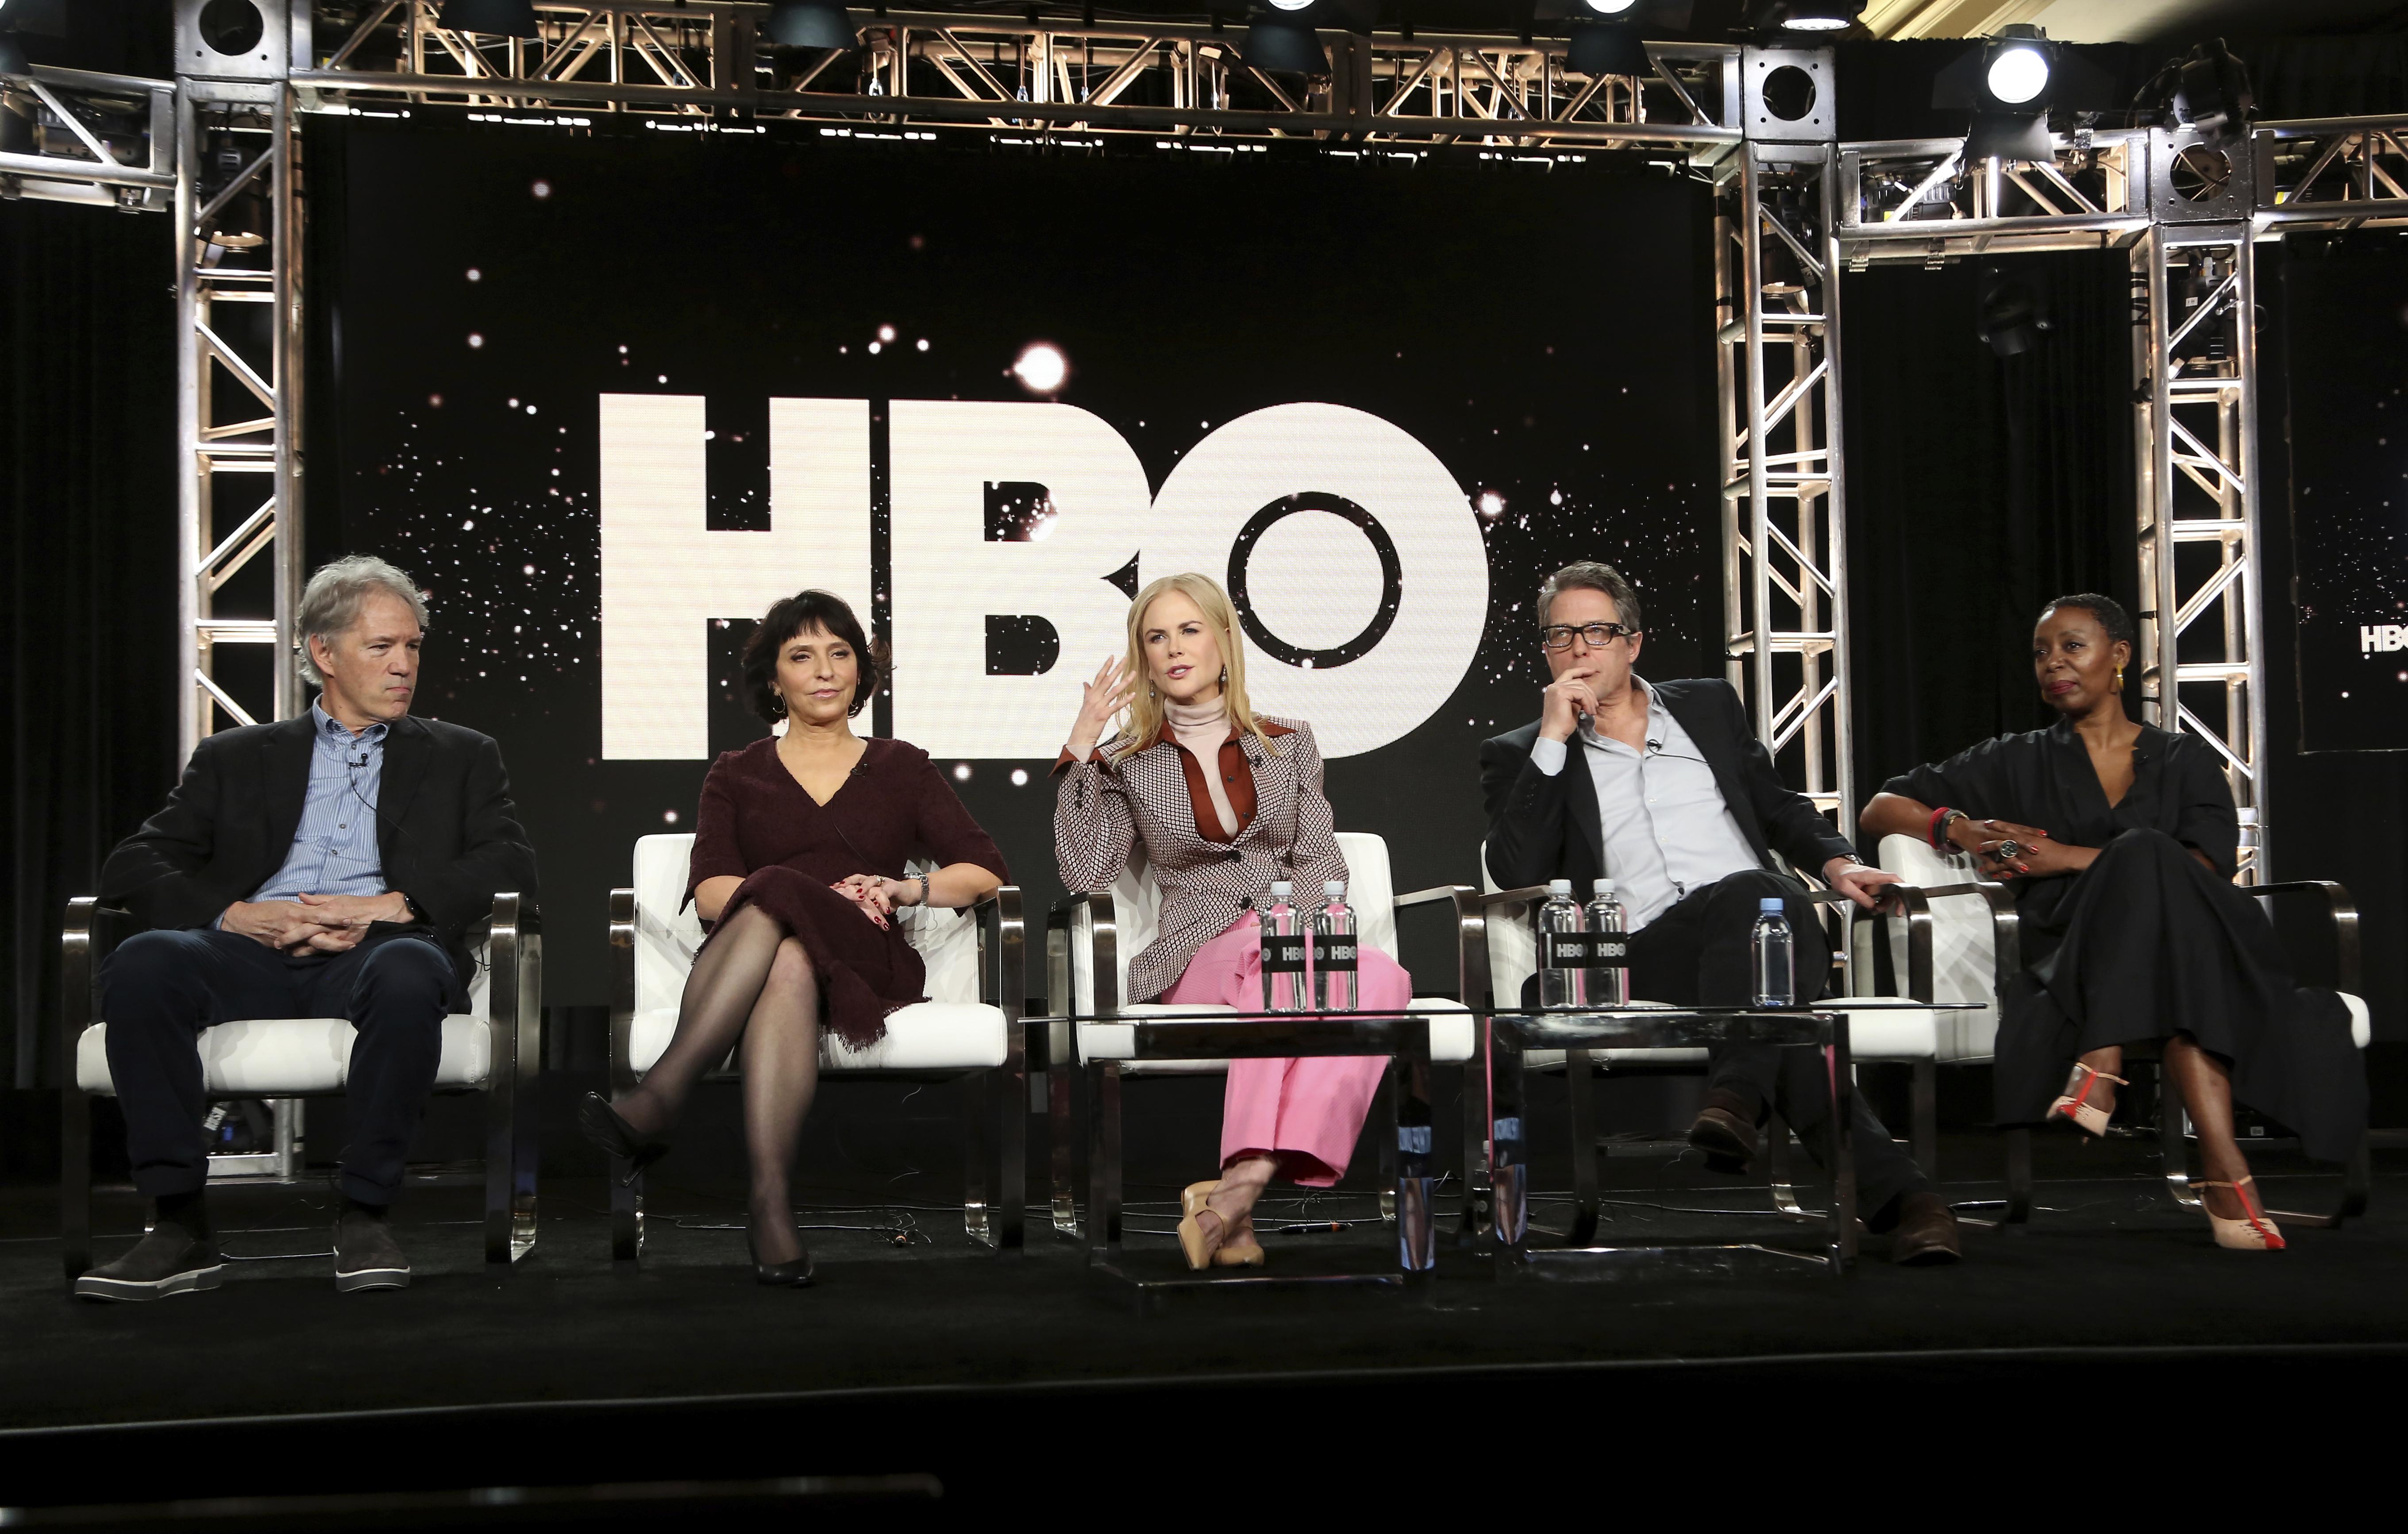 David E. Kelley, from left, Susanne Bier, Nicole Kidman, Hugh Grant and Noma Dumezweni speak at the